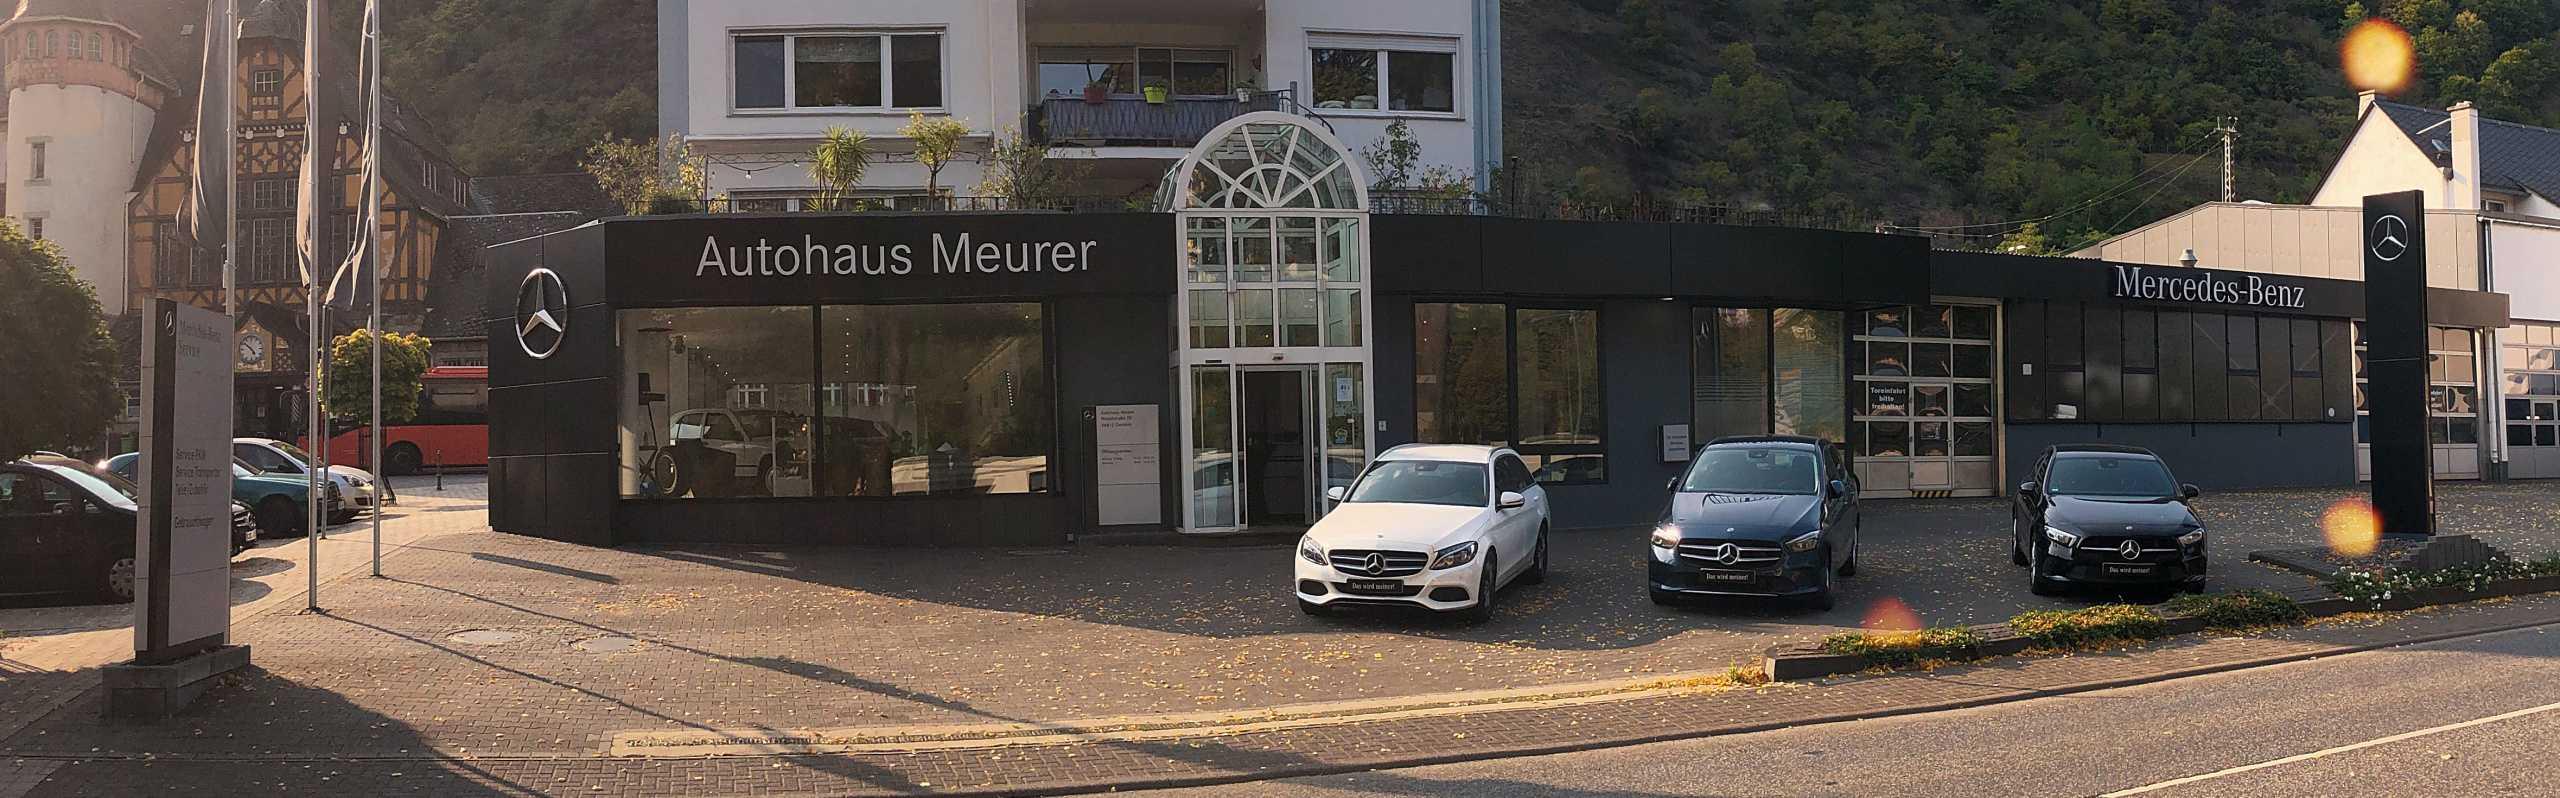 Autohaus Meurer Front scaled - Startseite